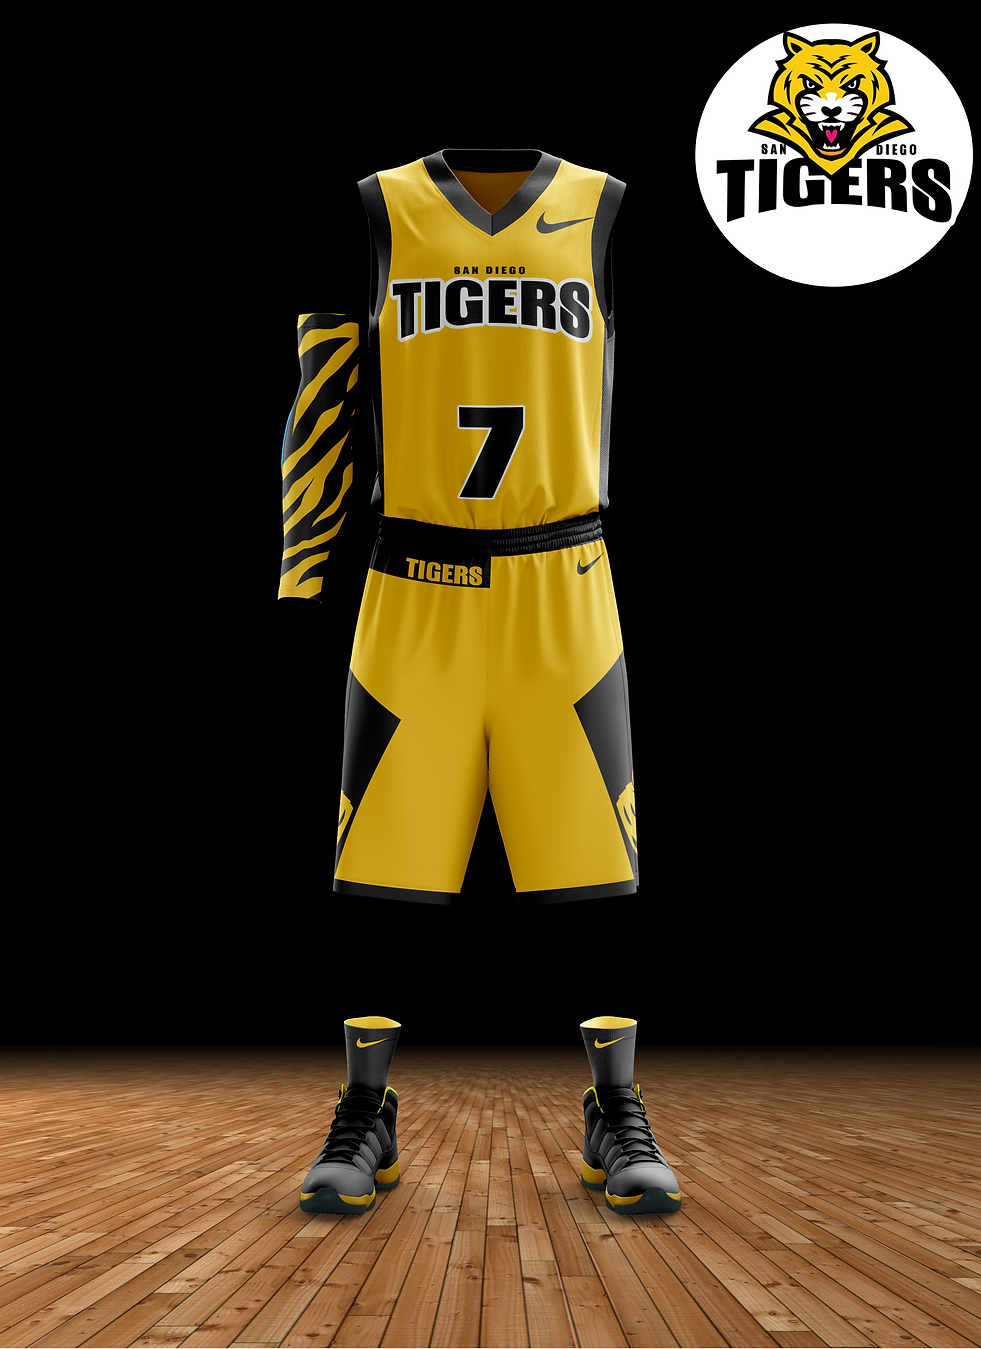 San Diego Tigers jersey